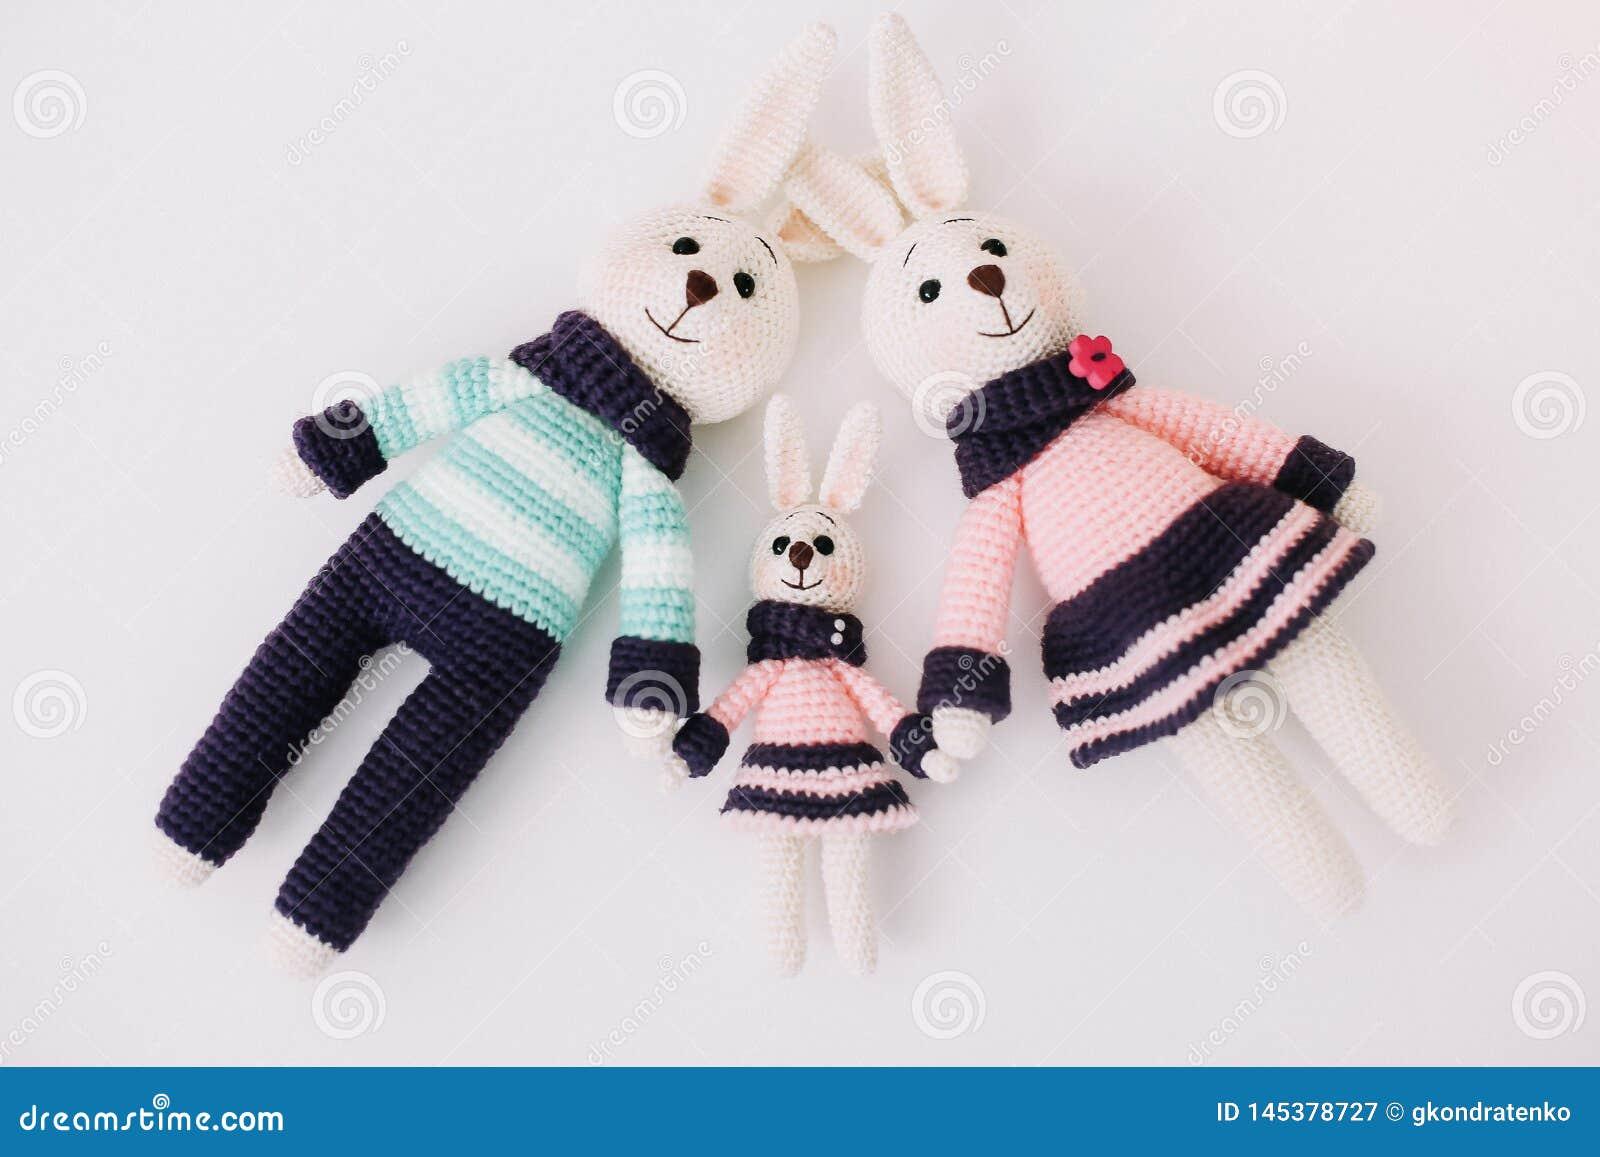 Ravelry: Bunny Family - patterns | 1155x1600